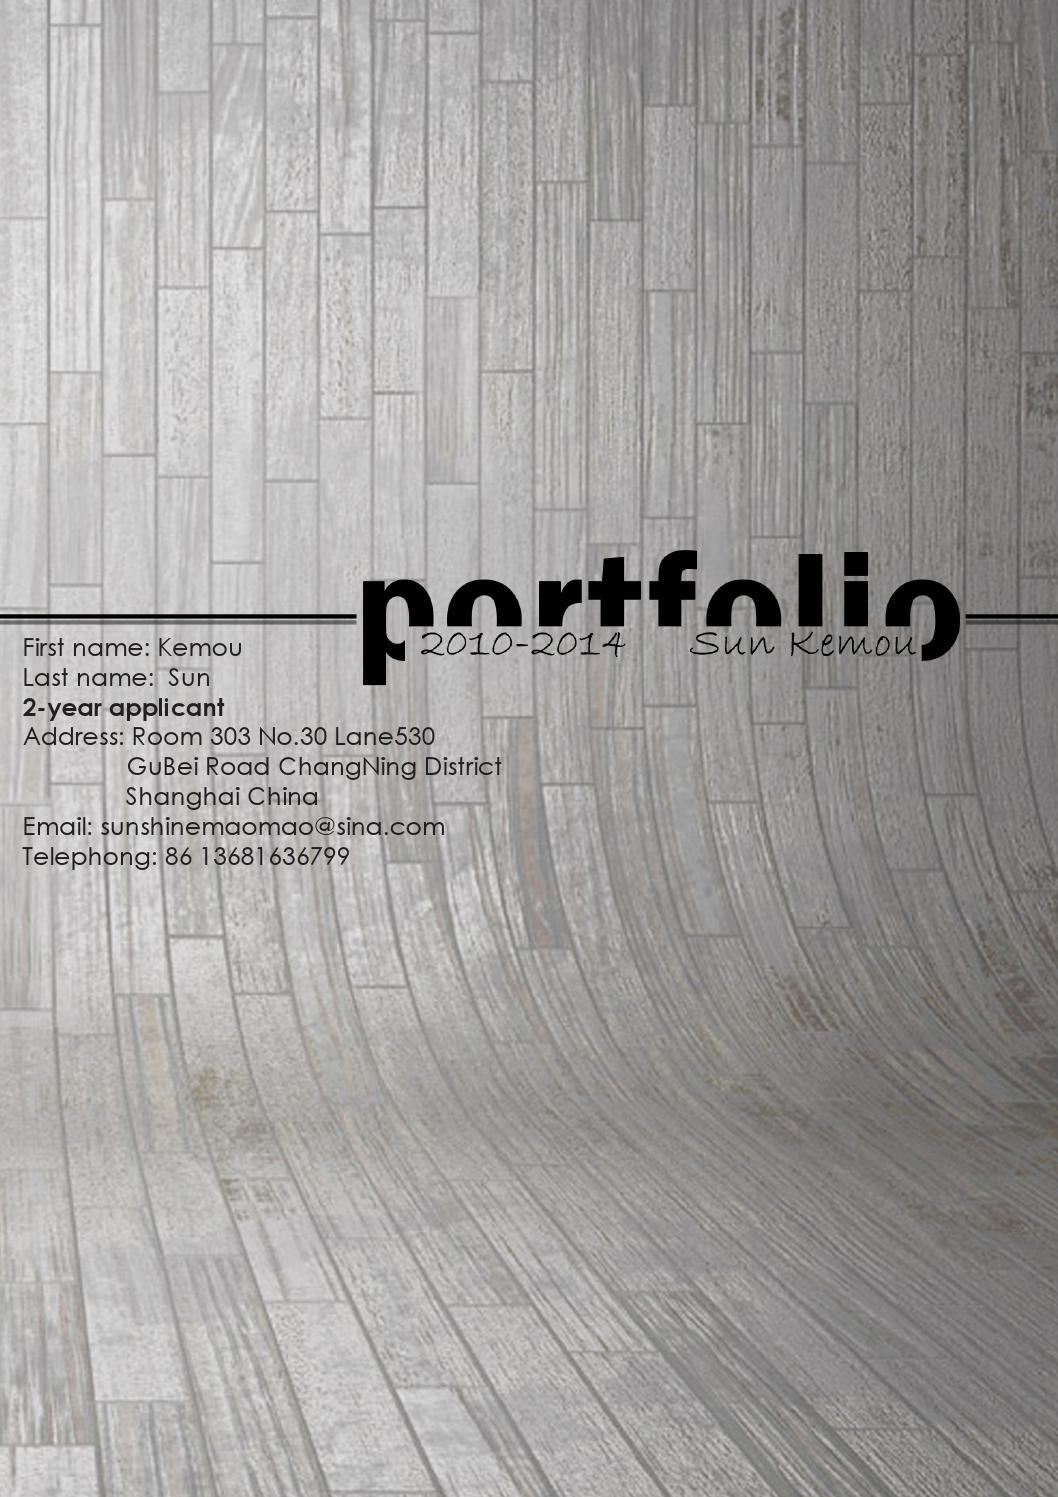 Sun kemou architecture portfolio by sun kemou issuu - Fiu interior design prerequisites ...